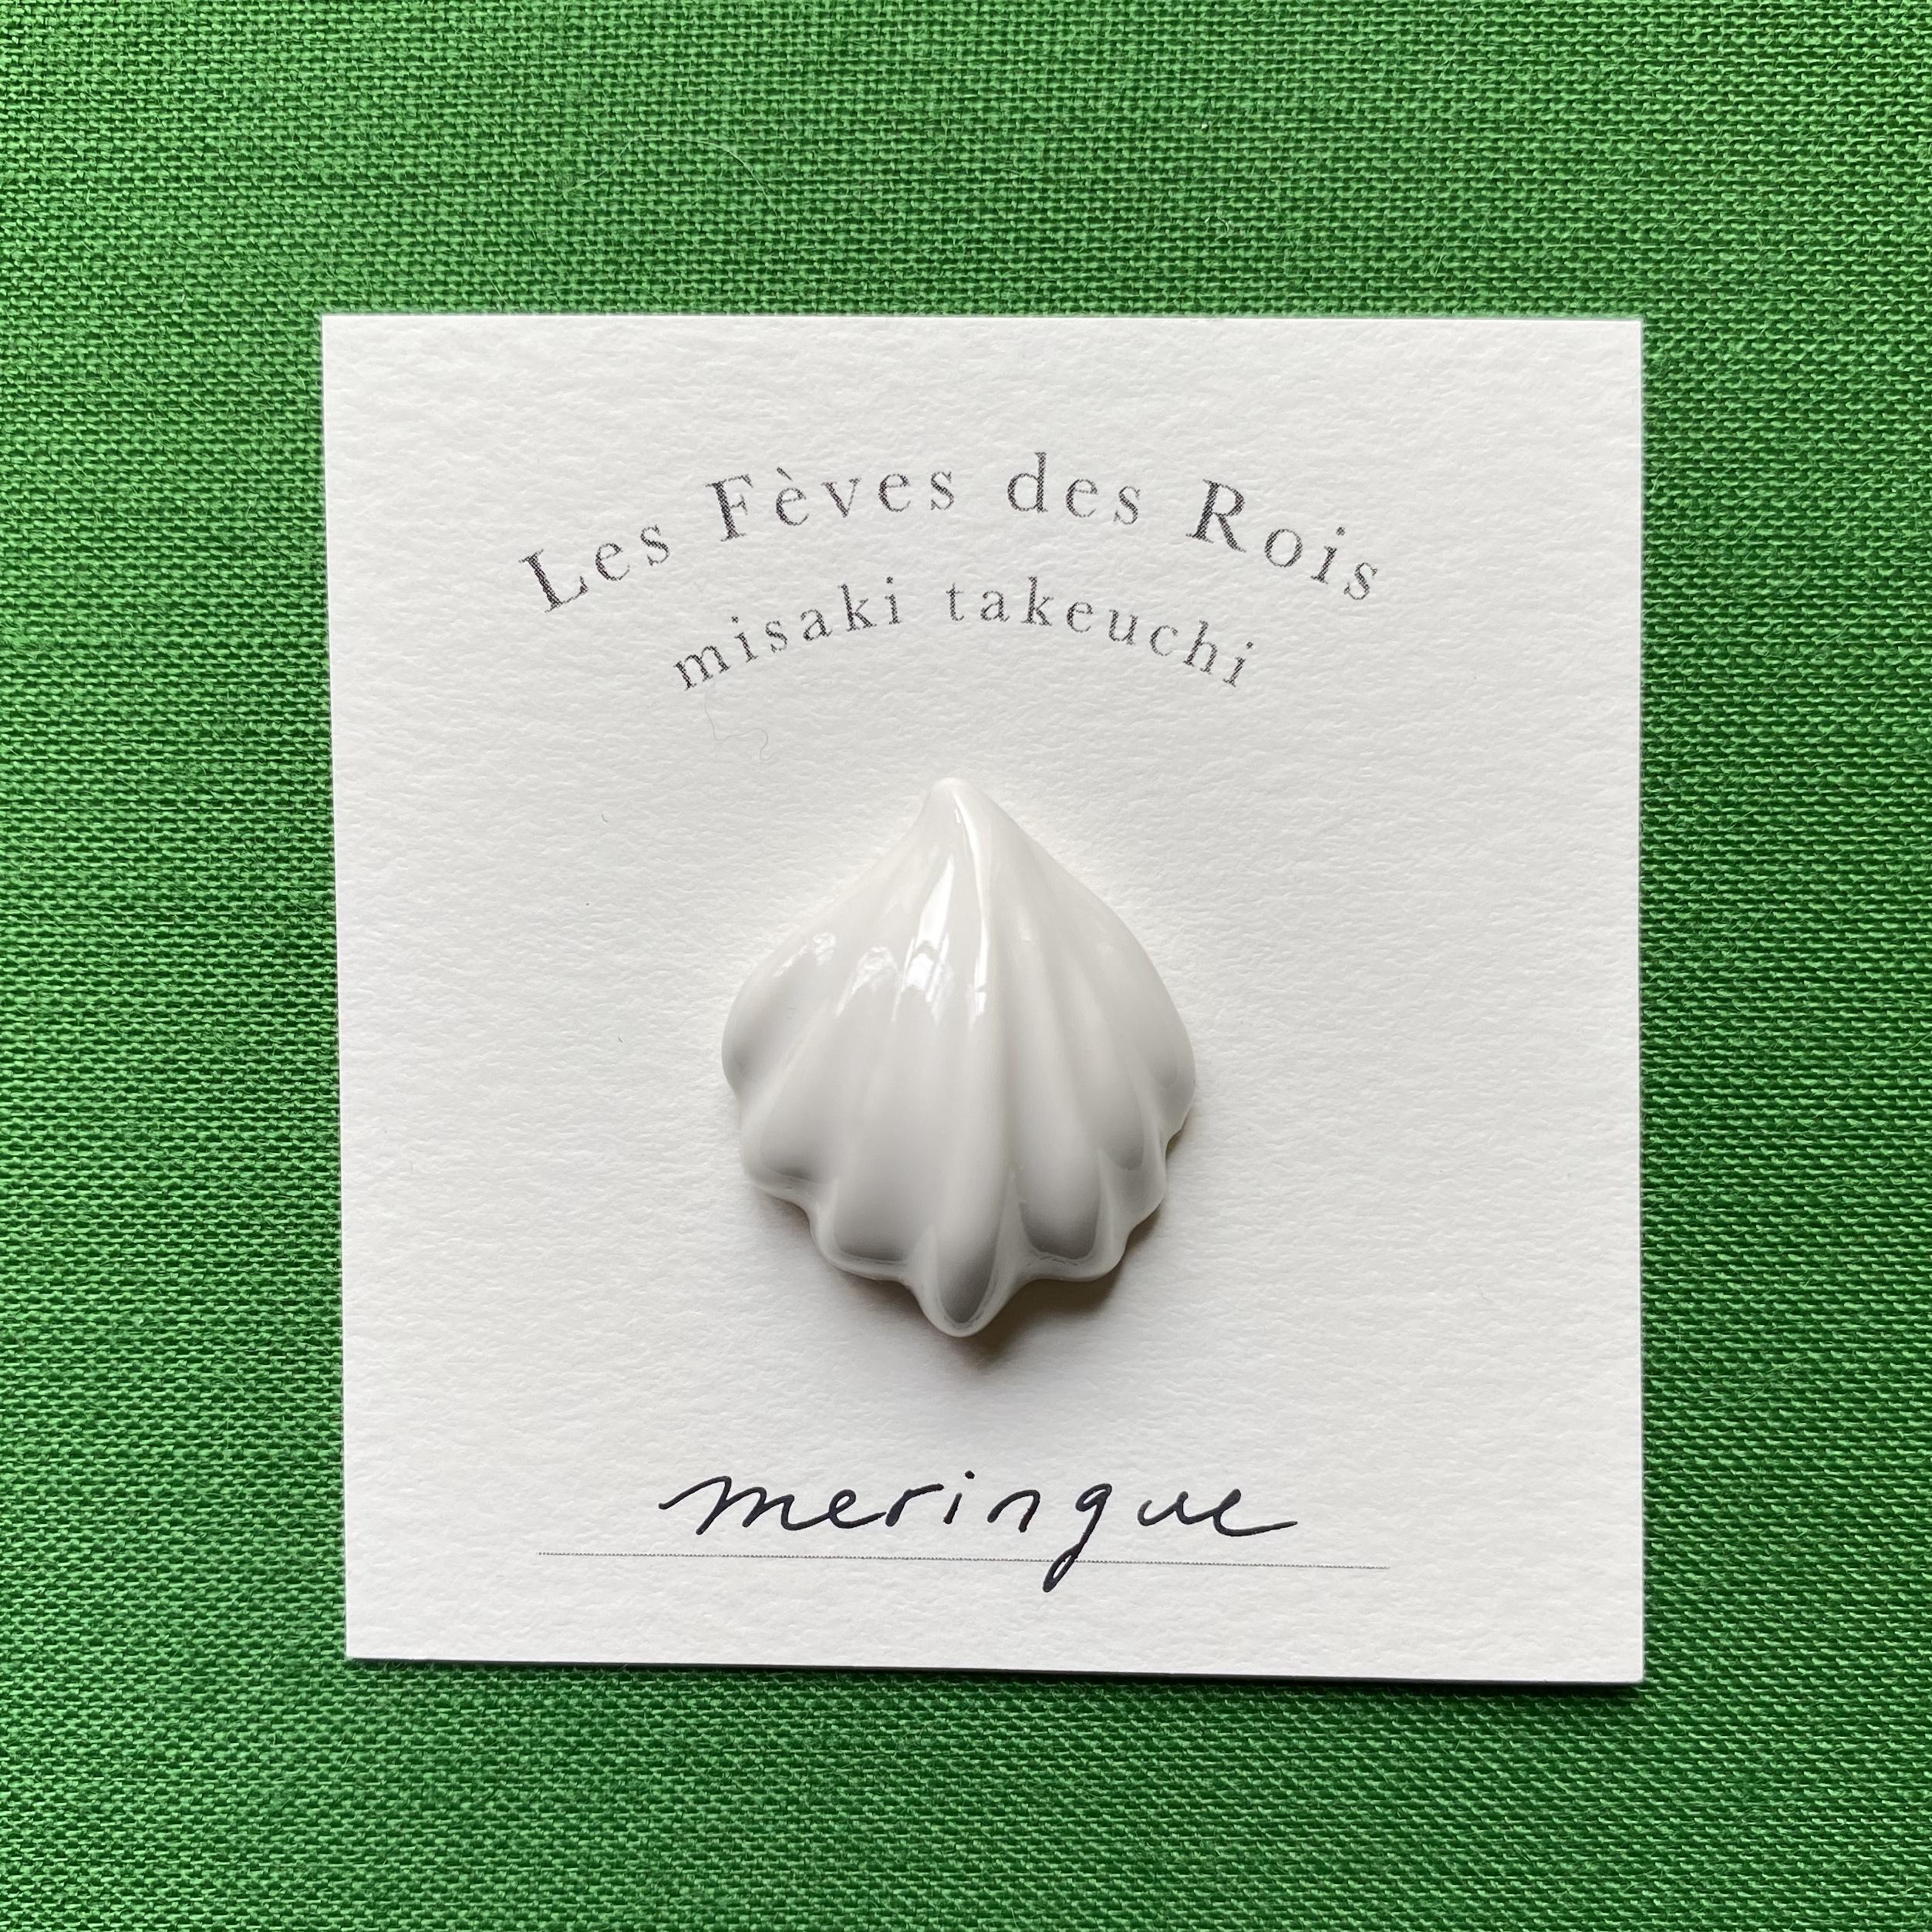 meringue (メレンゲ)misaki takeuchi ハンドメイドフェーヴ/mt026